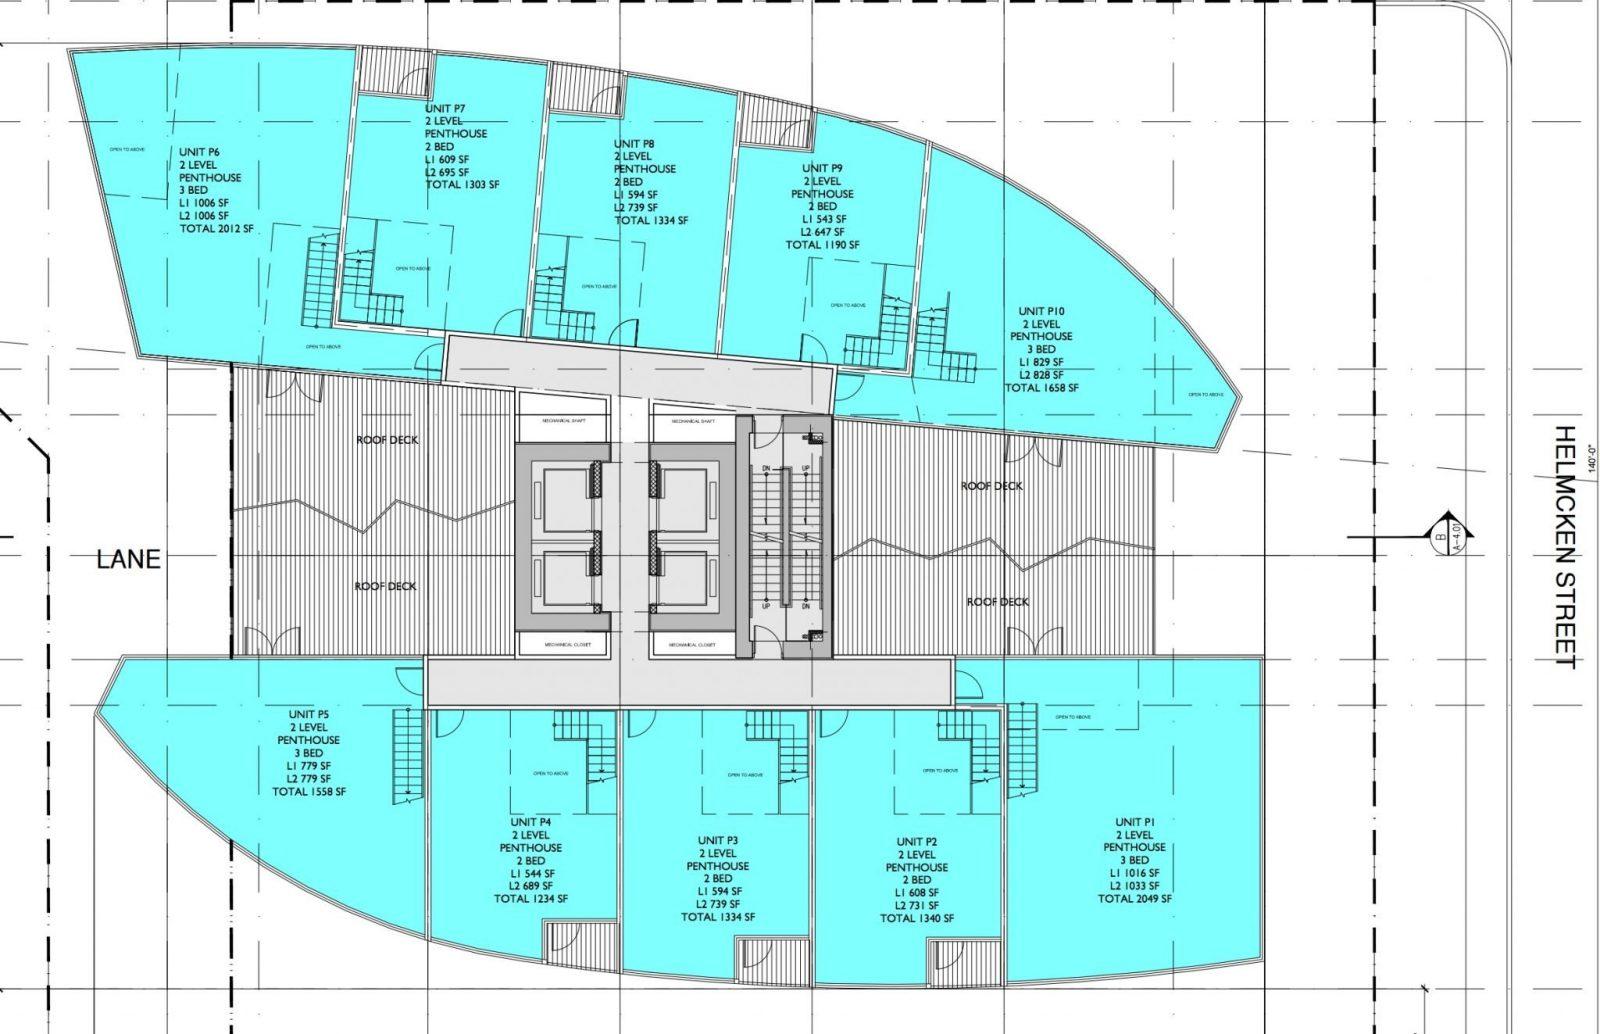 8x-on-the-park-penthouse-floorplans-floor-plans-presale - urbanyvr